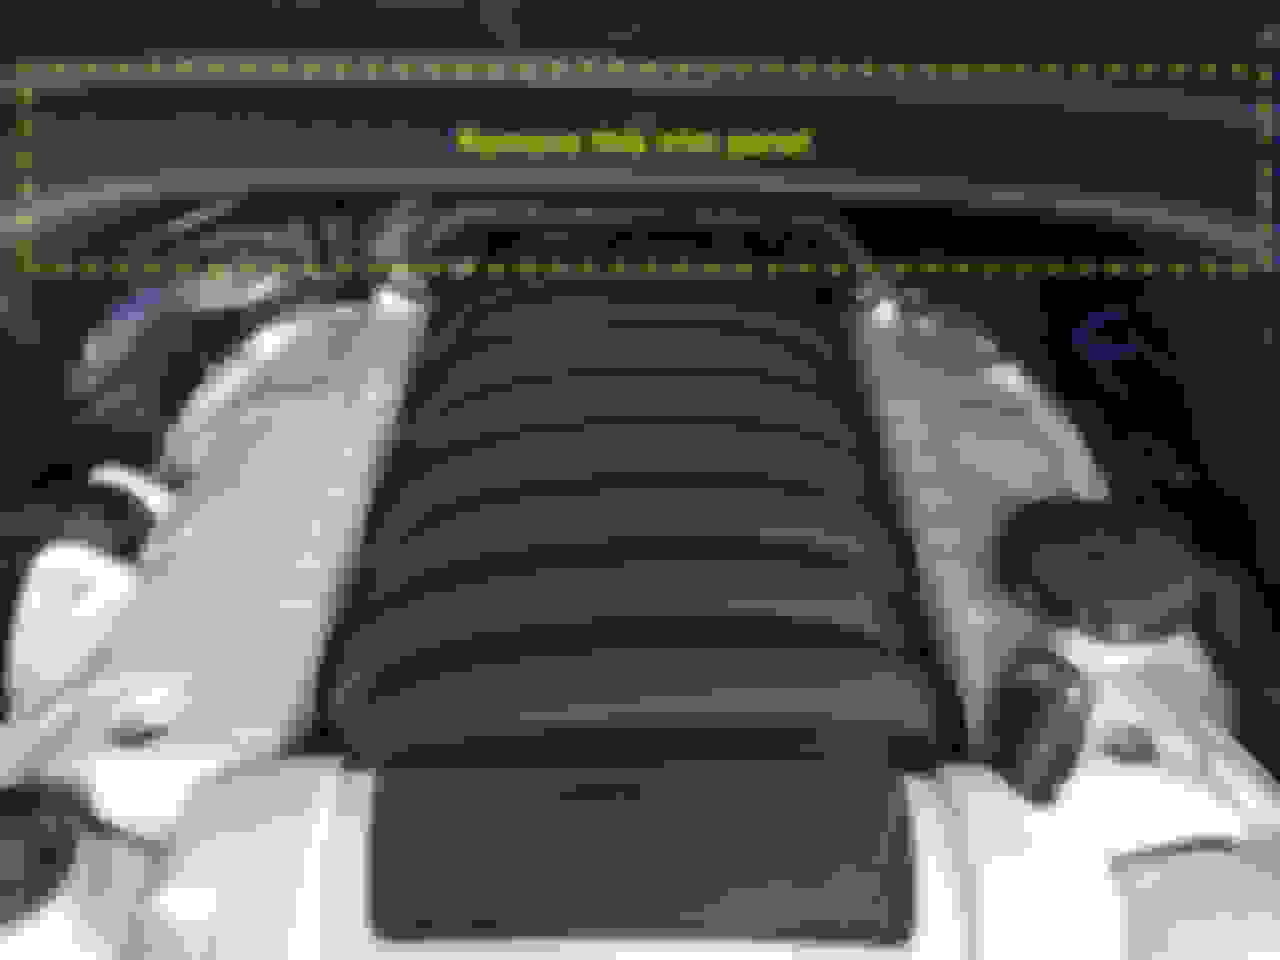 957 Cayenne: DIY - V8 Crankshaft Position Sensor Replacement